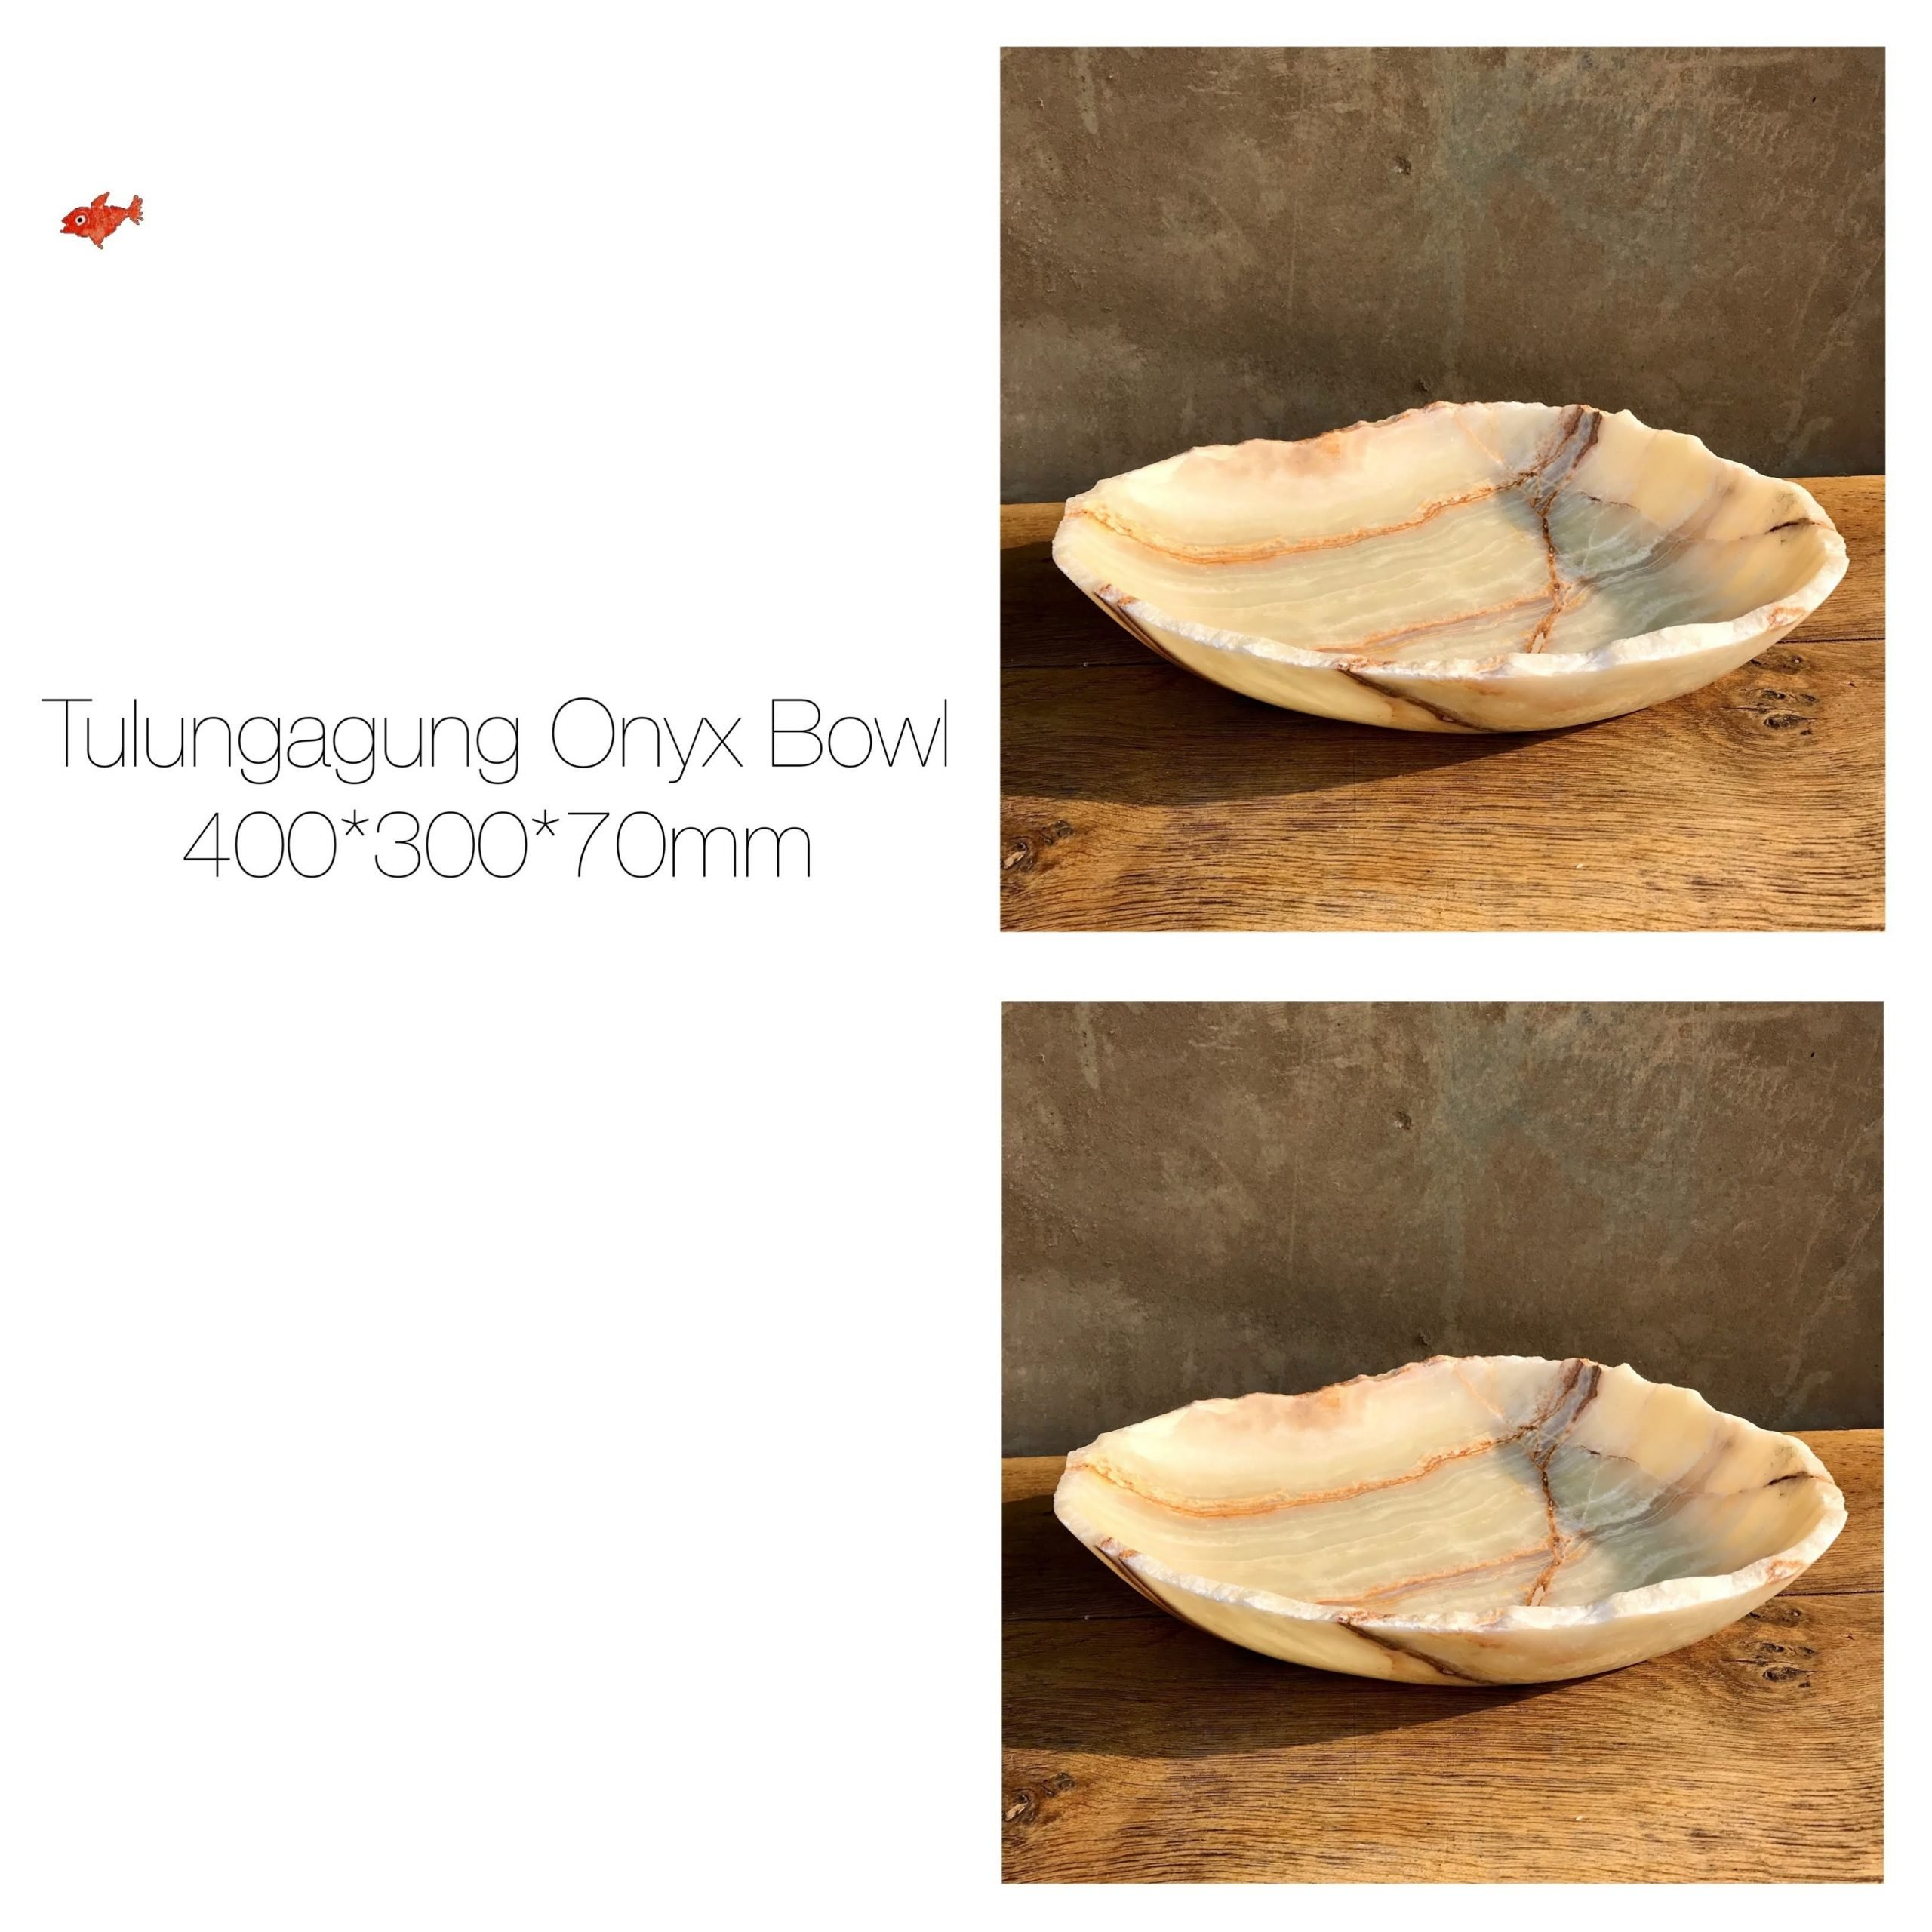 Tulungagung Onyx Bowl